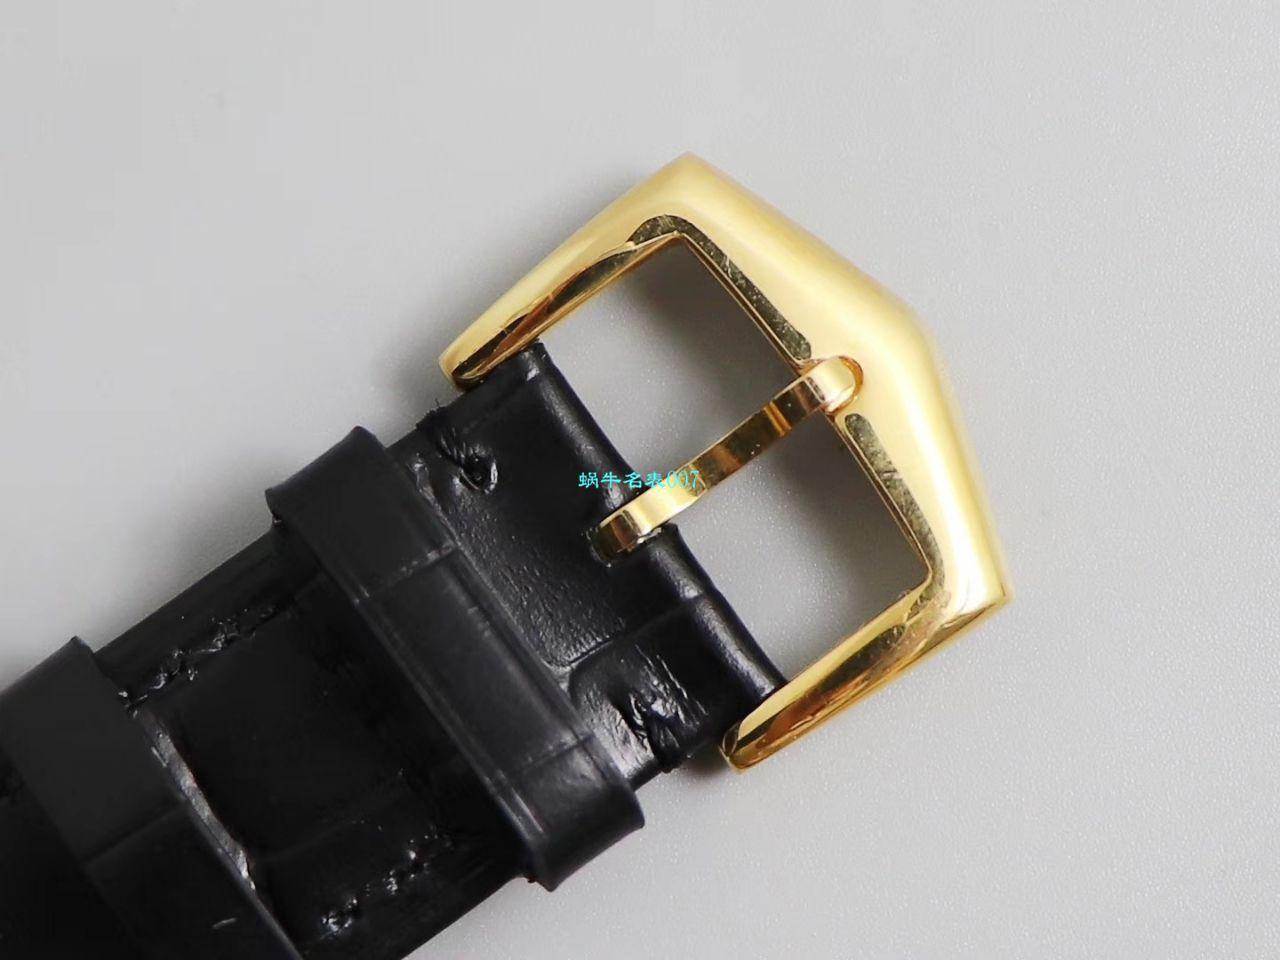 TW厂顶级复刻表百达翡丽古典表系列5120J-00,5120G-001腕表 / BD266